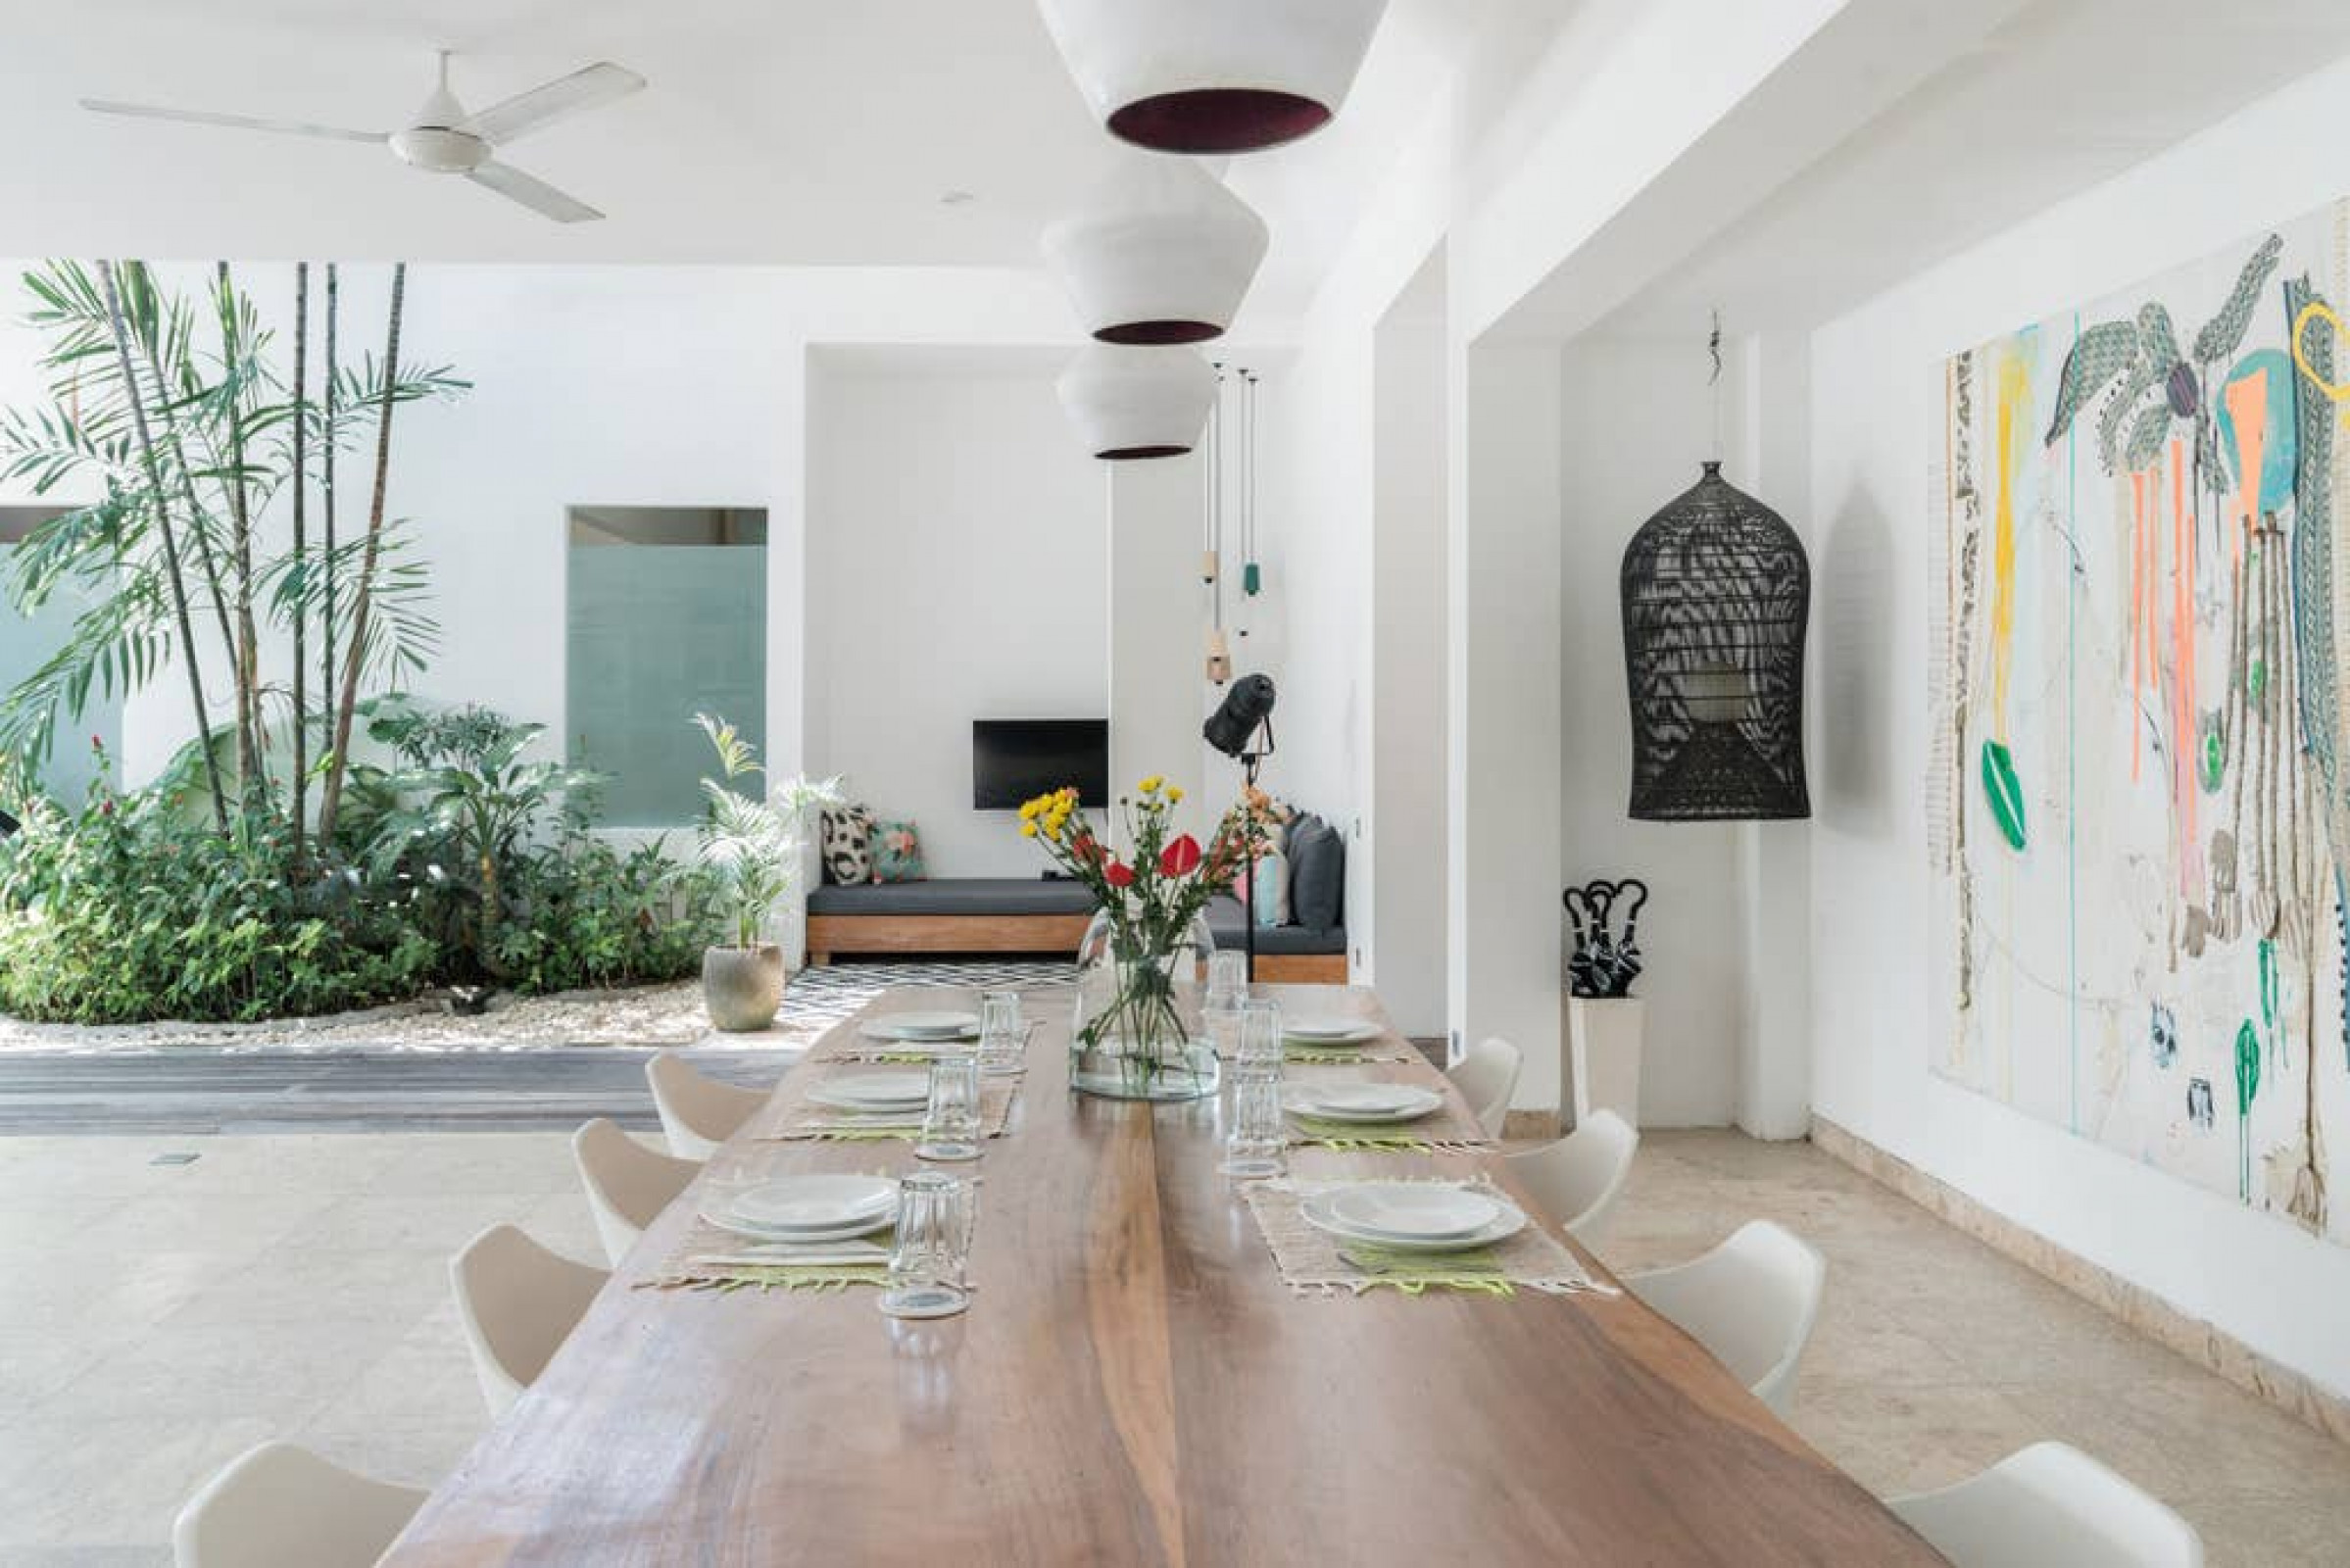 MVillasBali | Villa MEIWENTI - Spacious with Art and Design, Middle of Canggu